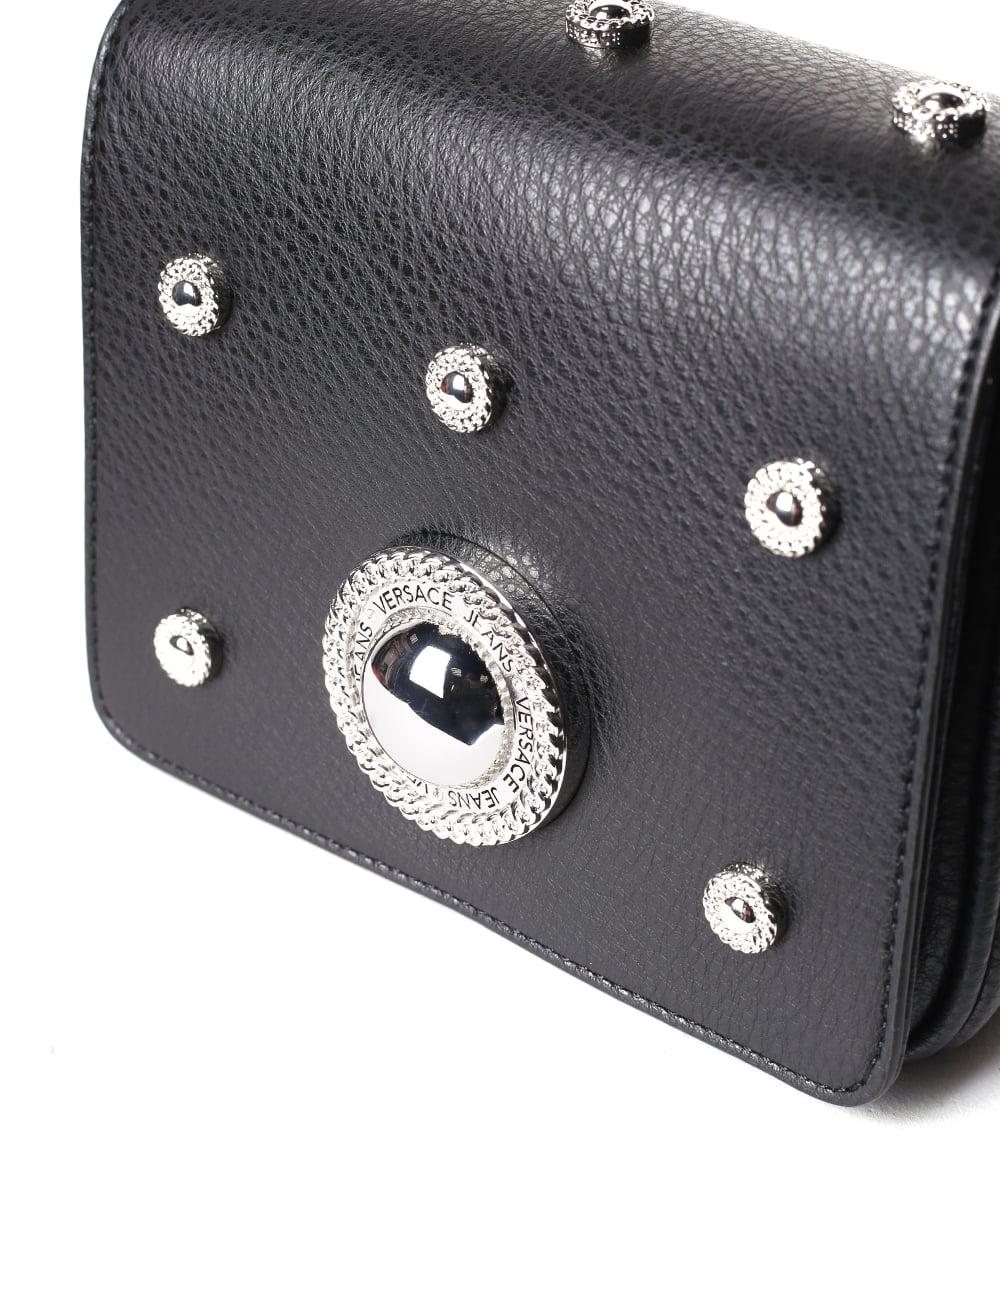 Versace Jeans Women s Studded Crossbody Bag 8bf37c4fac324